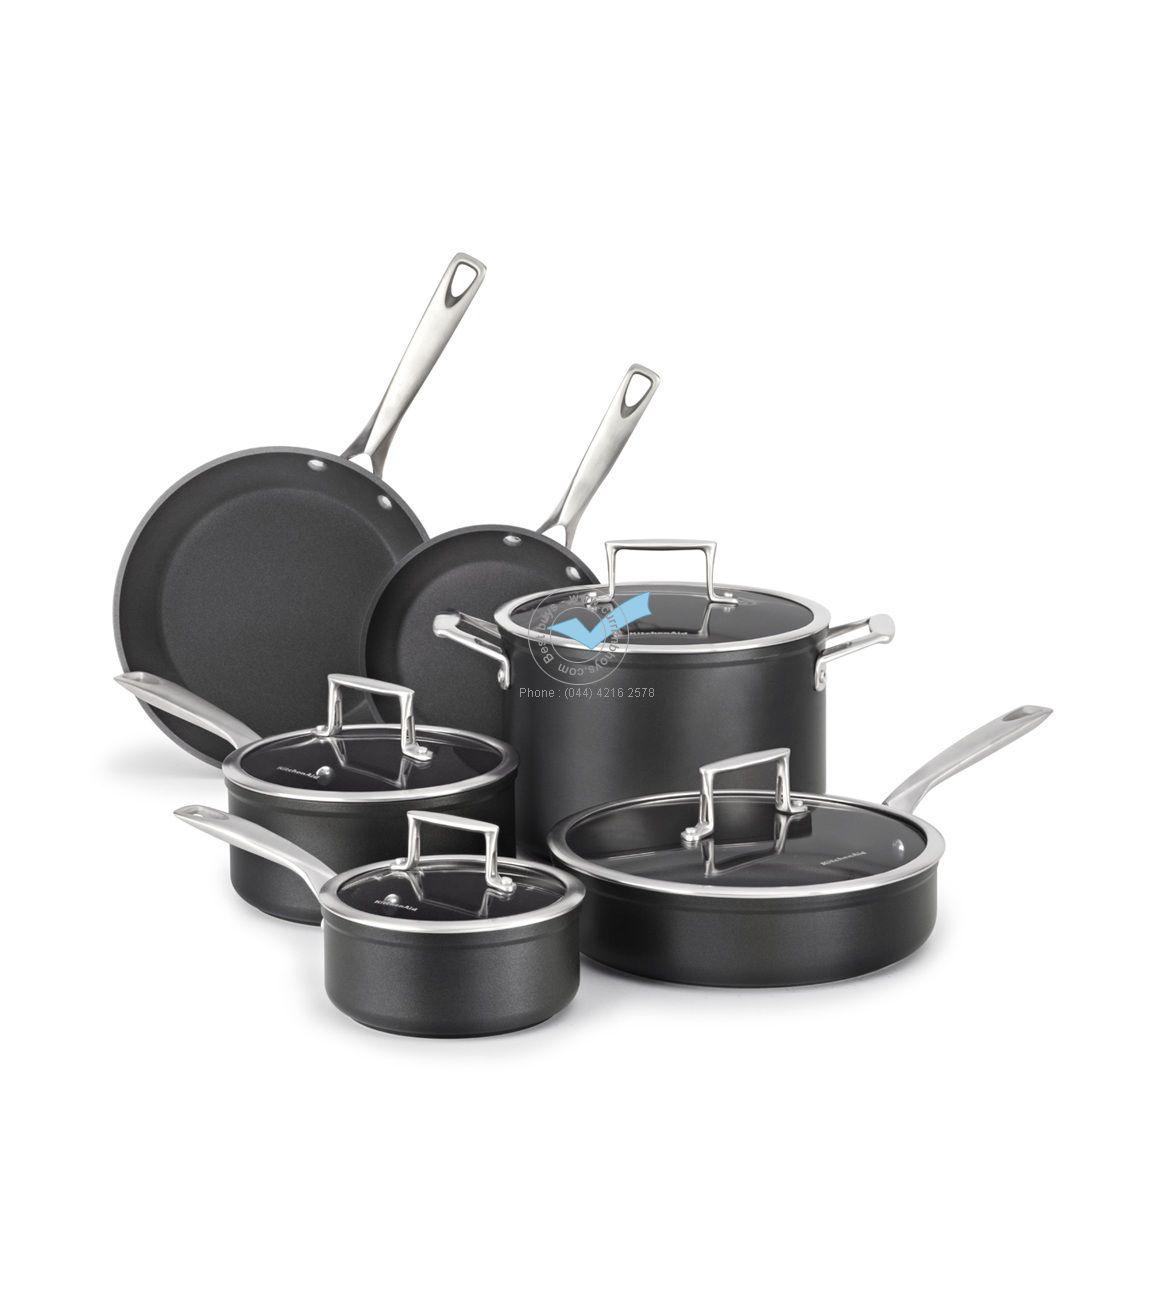 Tableware Liances Electrical Item Kitchenaid Cookware Prof Hard Anodized Black Metallic 10 Kch2s10km 14875